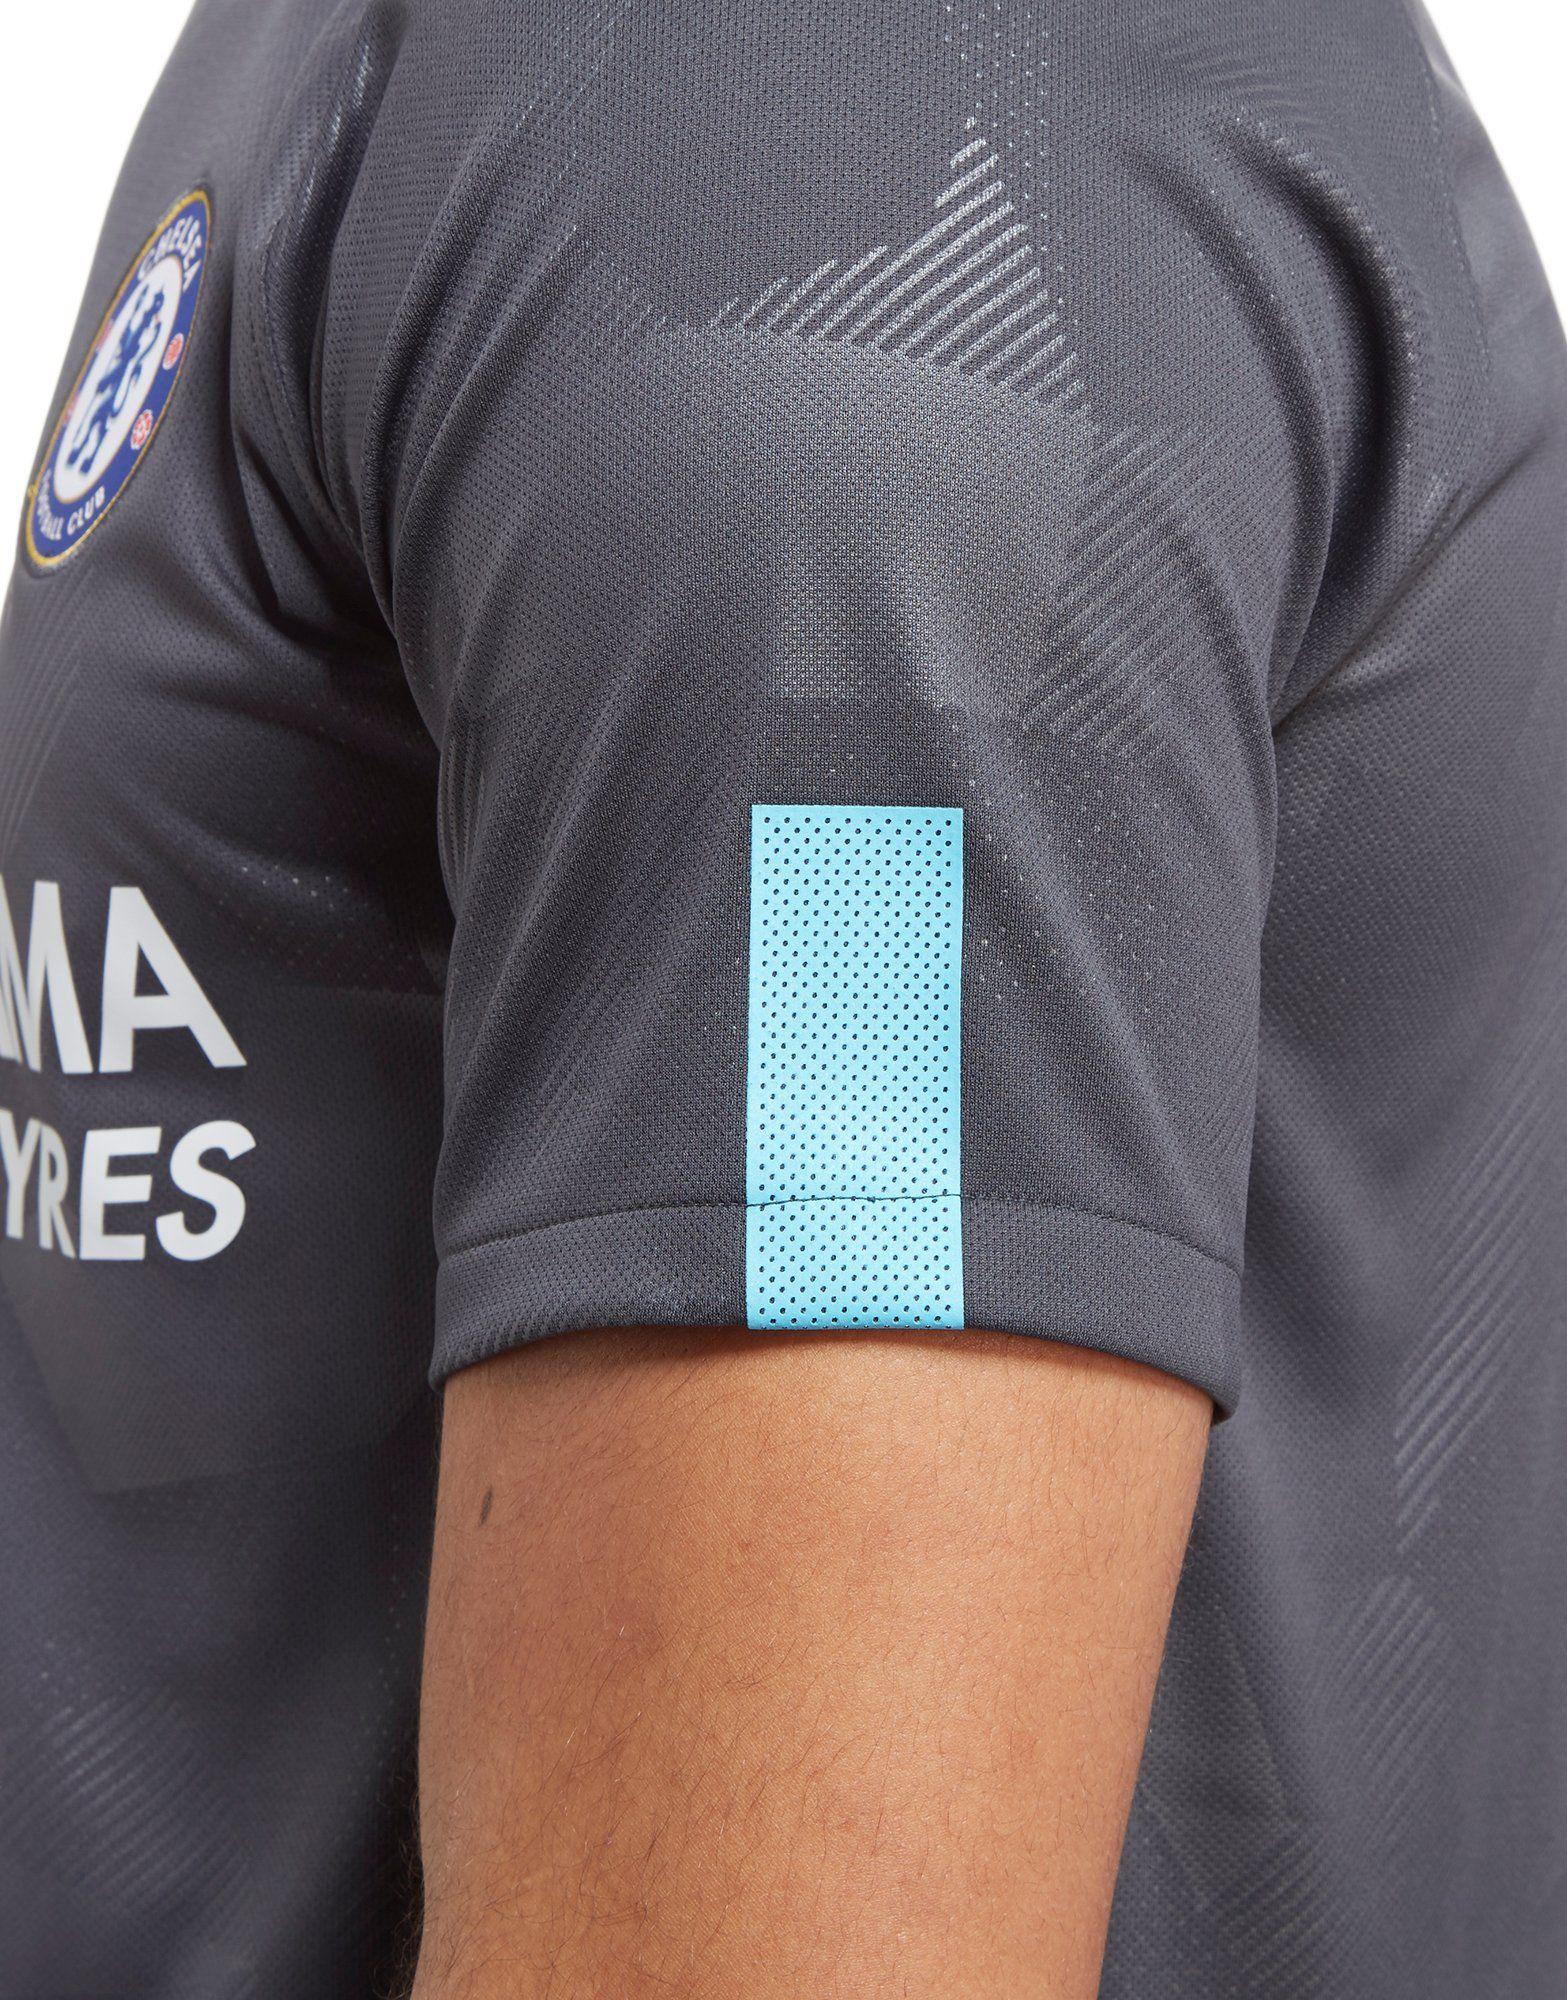 Drittes 2017 2017 Nike Drittes Grau FC Nike FC Hemd 18 Chelsea Chelsea 18 vwpdgp